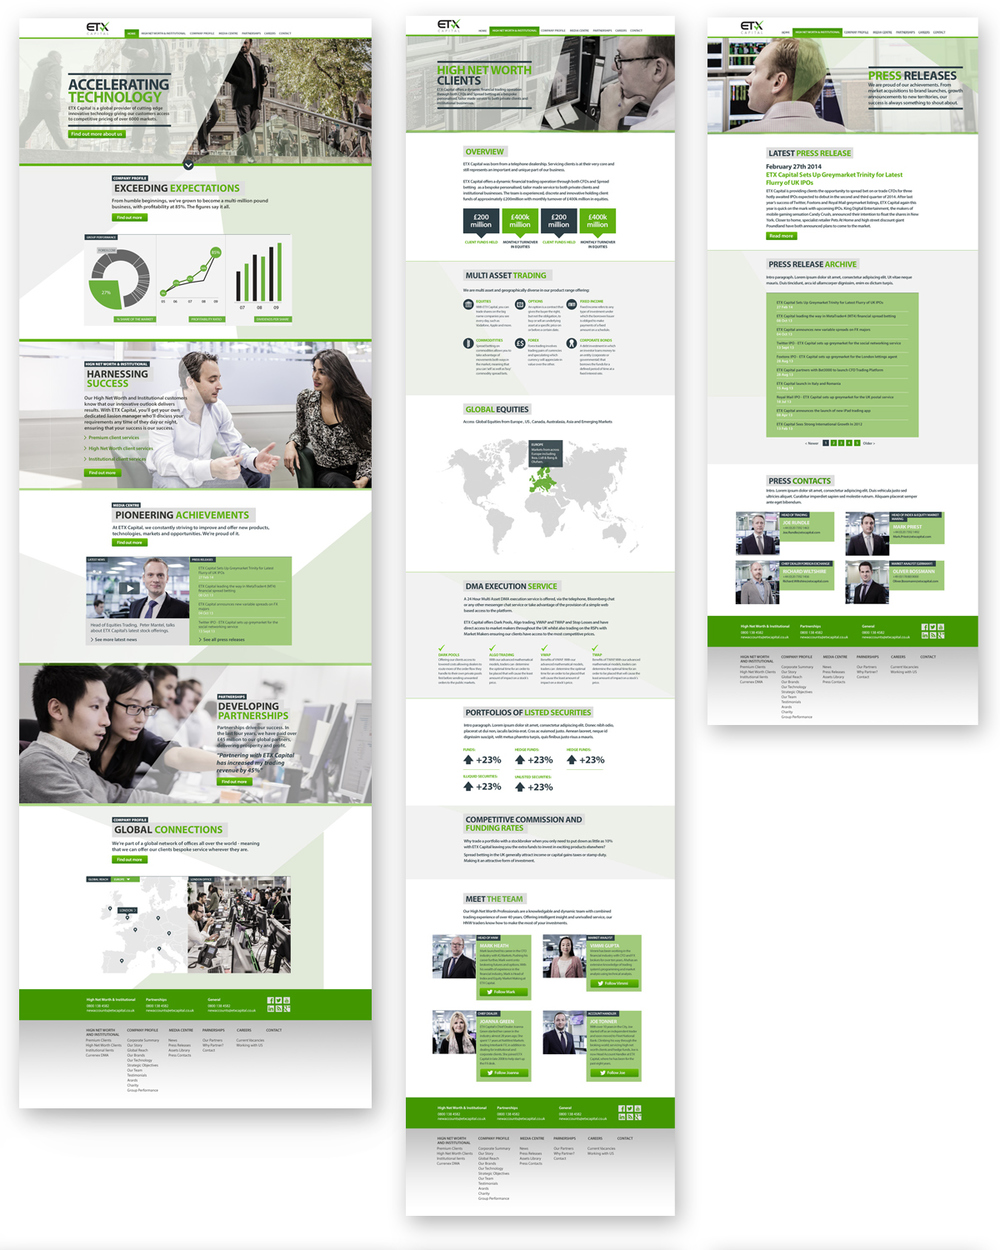 Website visuals